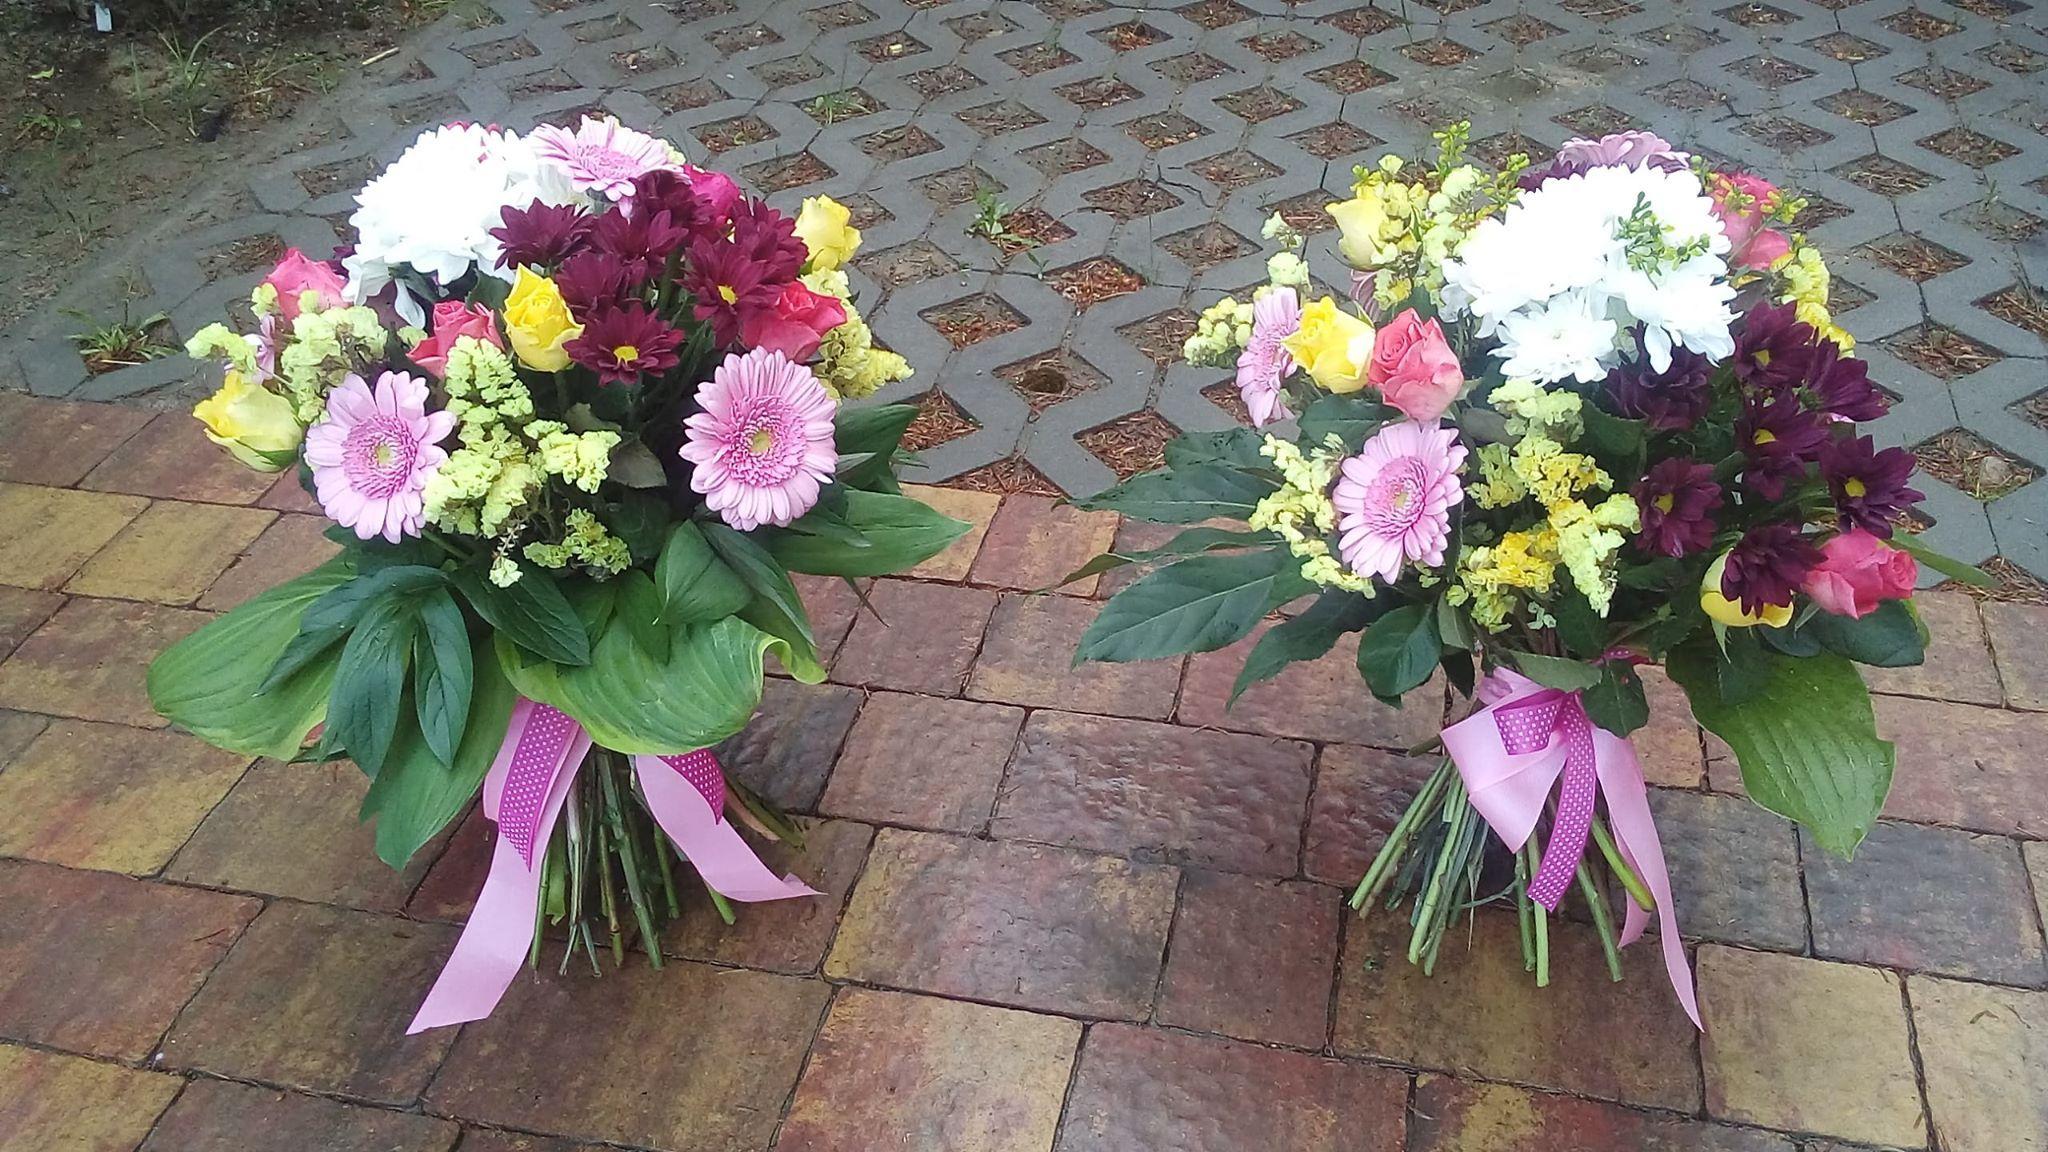 Bukiety Okolicznosciowe Floral Floral Wreath Wreaths